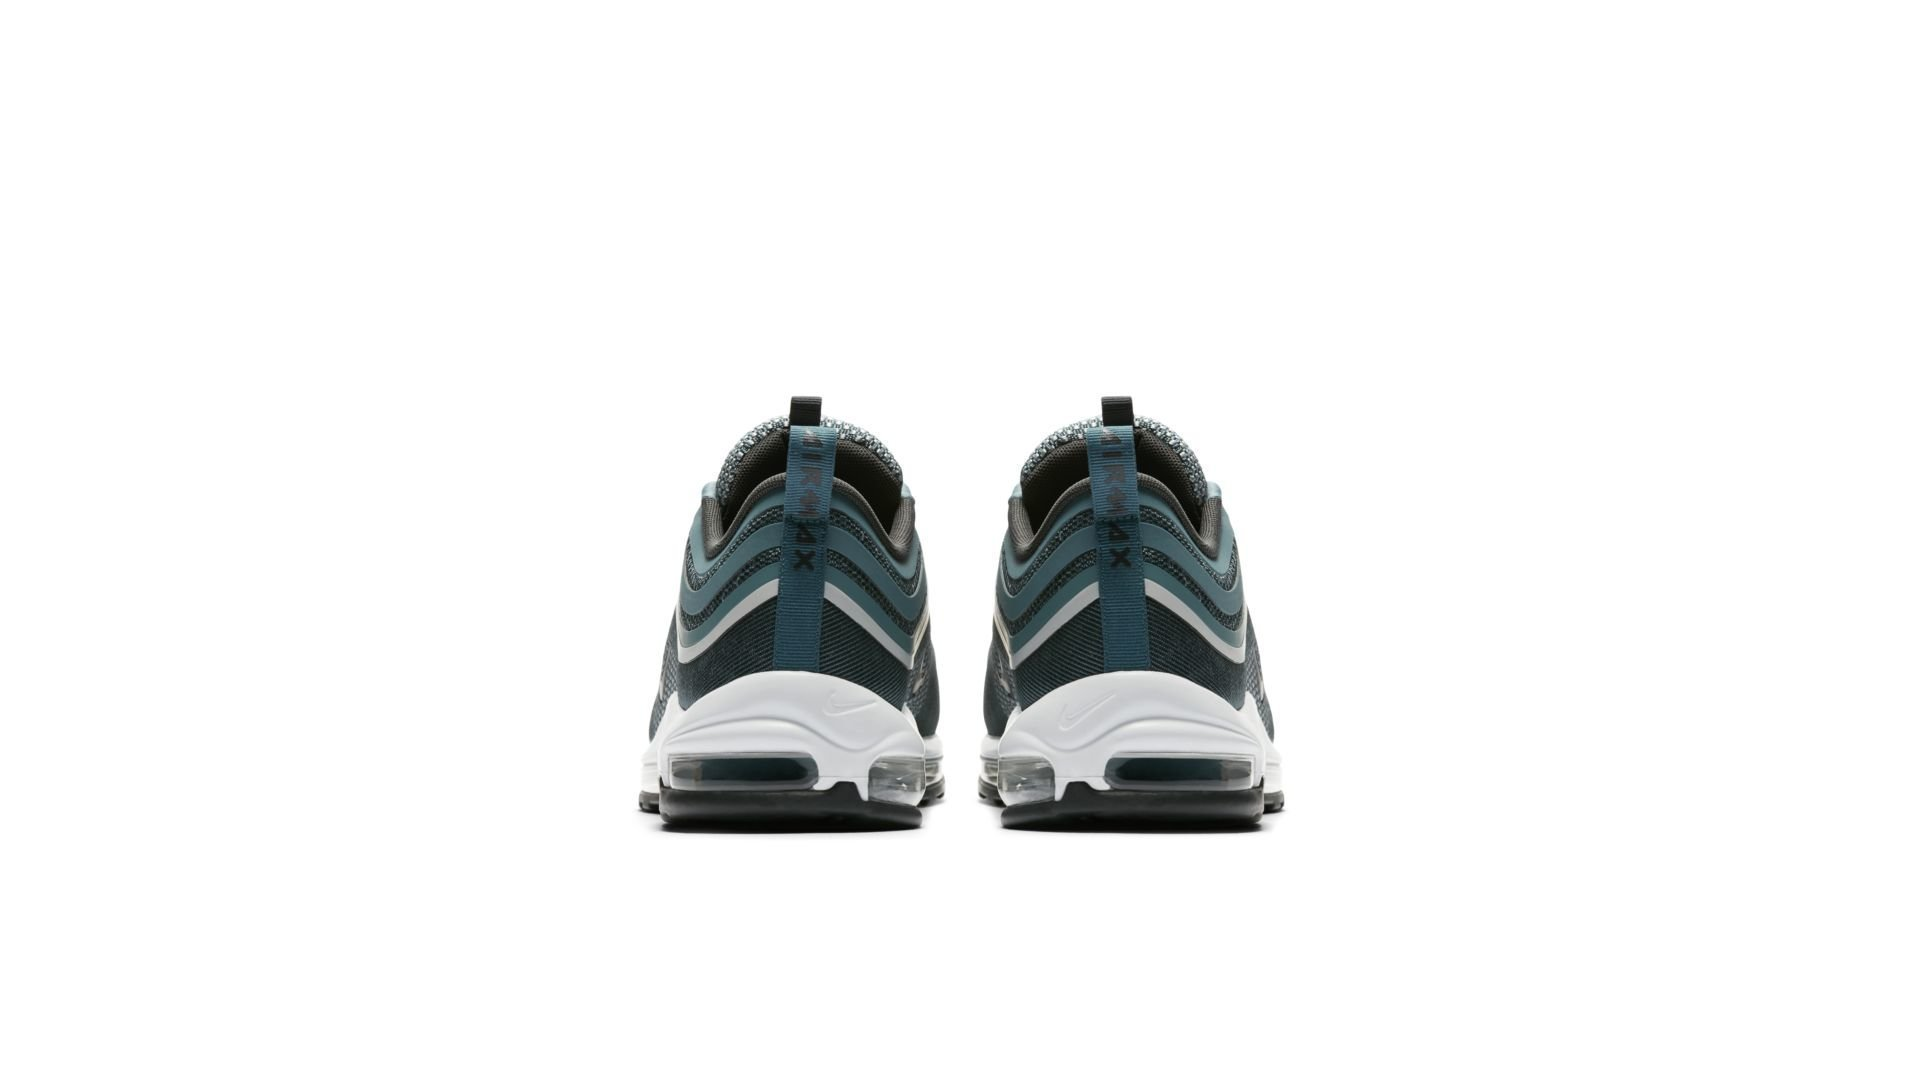 Nike Air Max 97 Ultra 17 Iced Jade (918356 300)